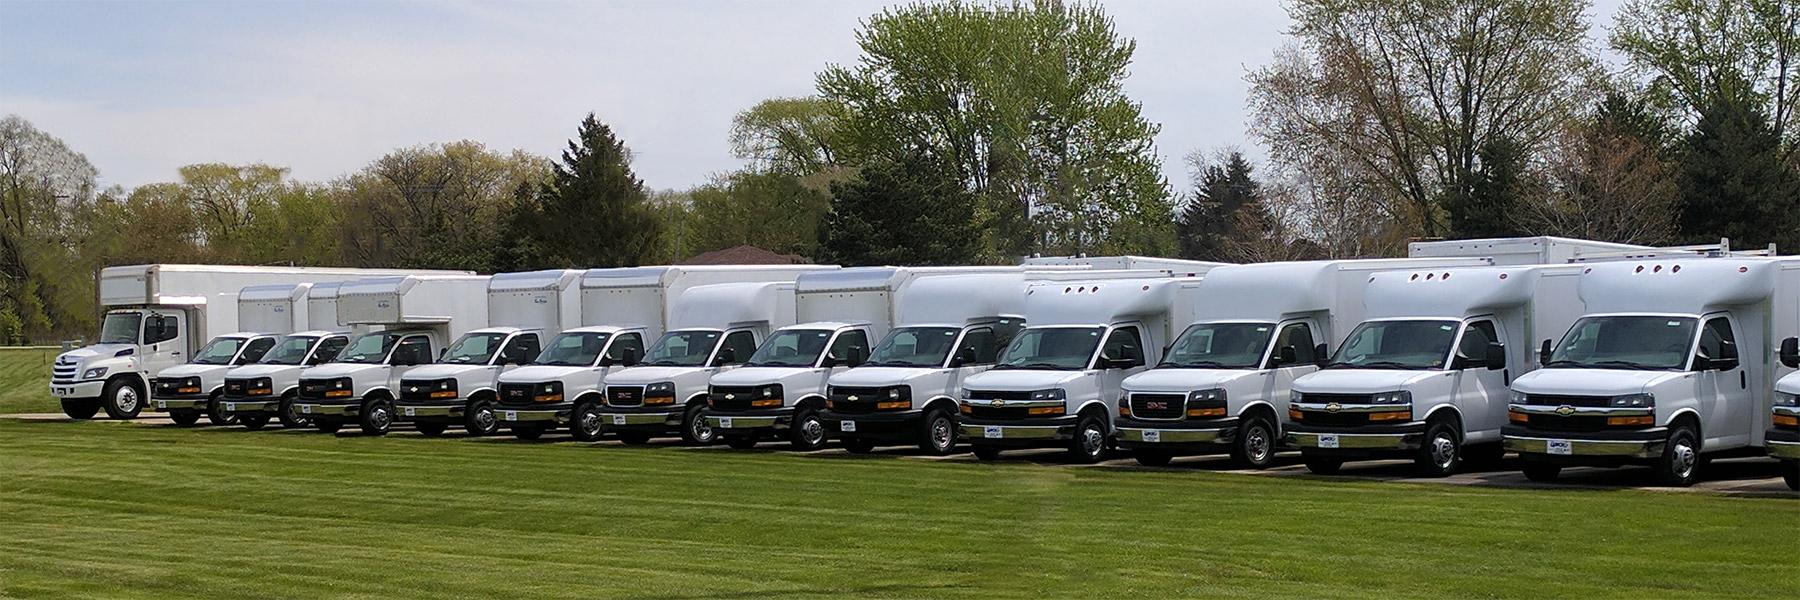 chevy-gm-cutaway-vans